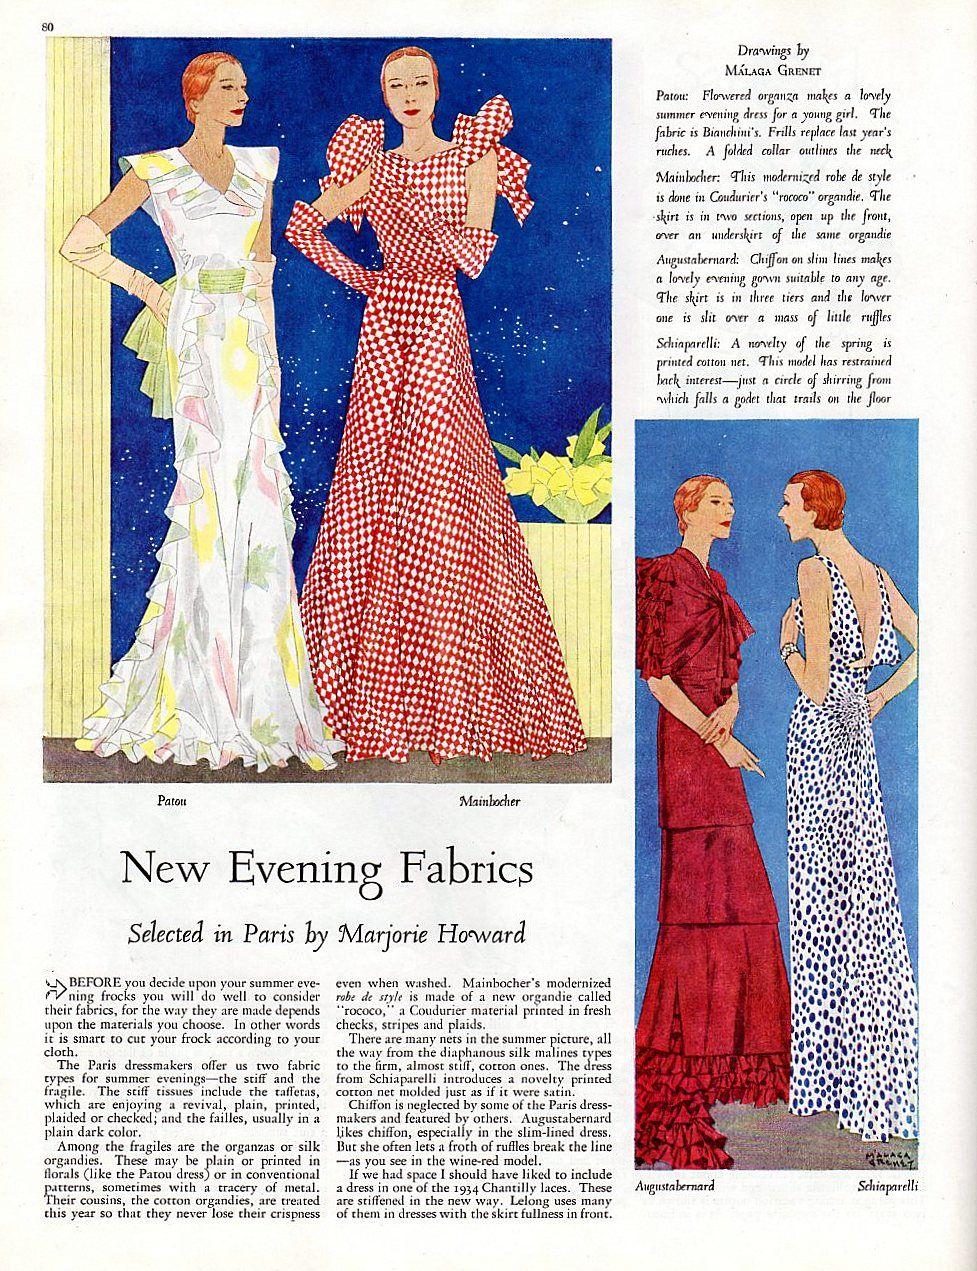 Womanus home companion june featuring evening dresses by patou